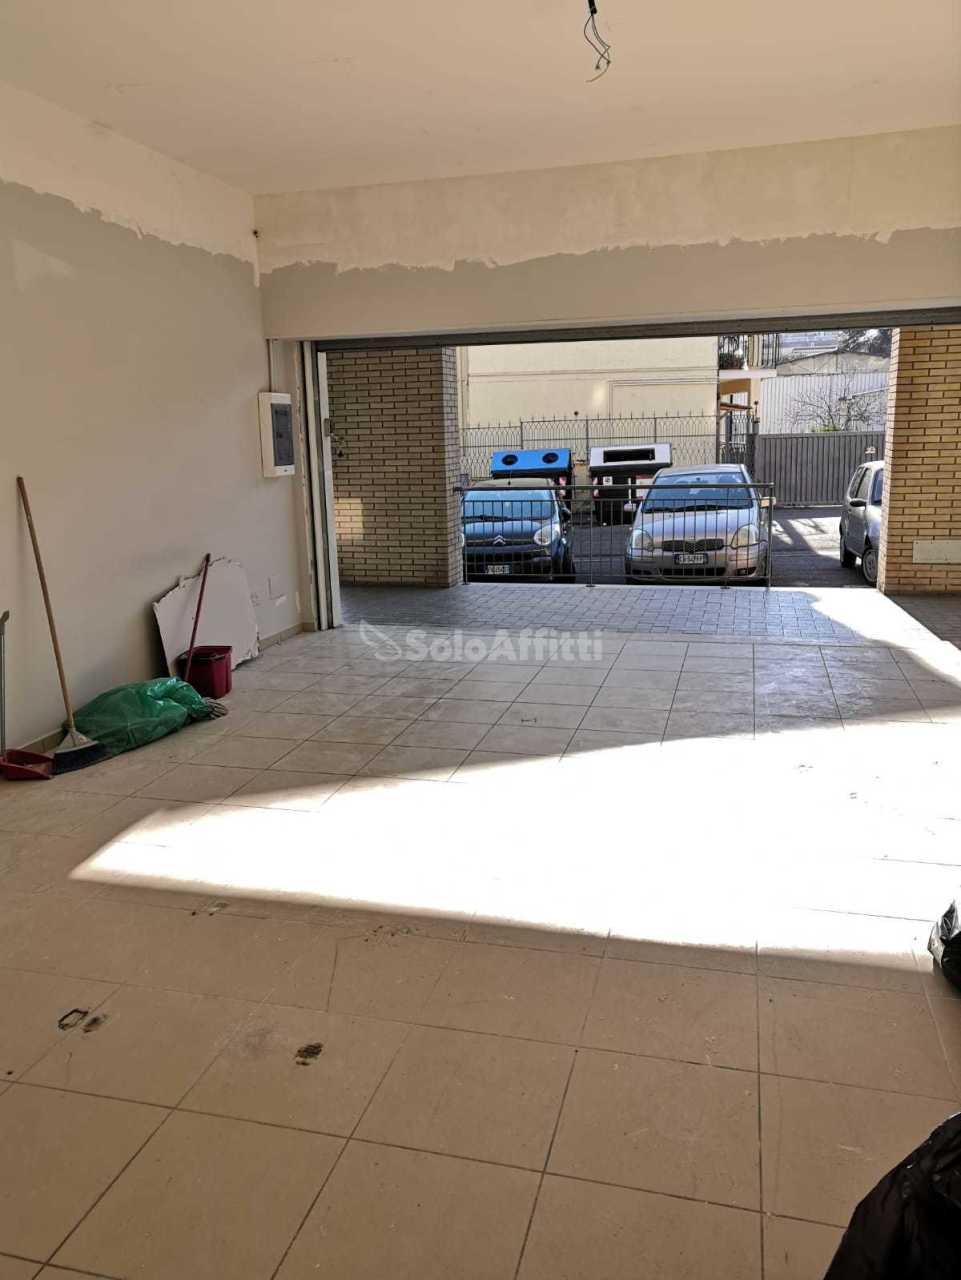 Fondo/negozio - 1 vetrina/luce a Castel Verde, Roma Rif. 11939025